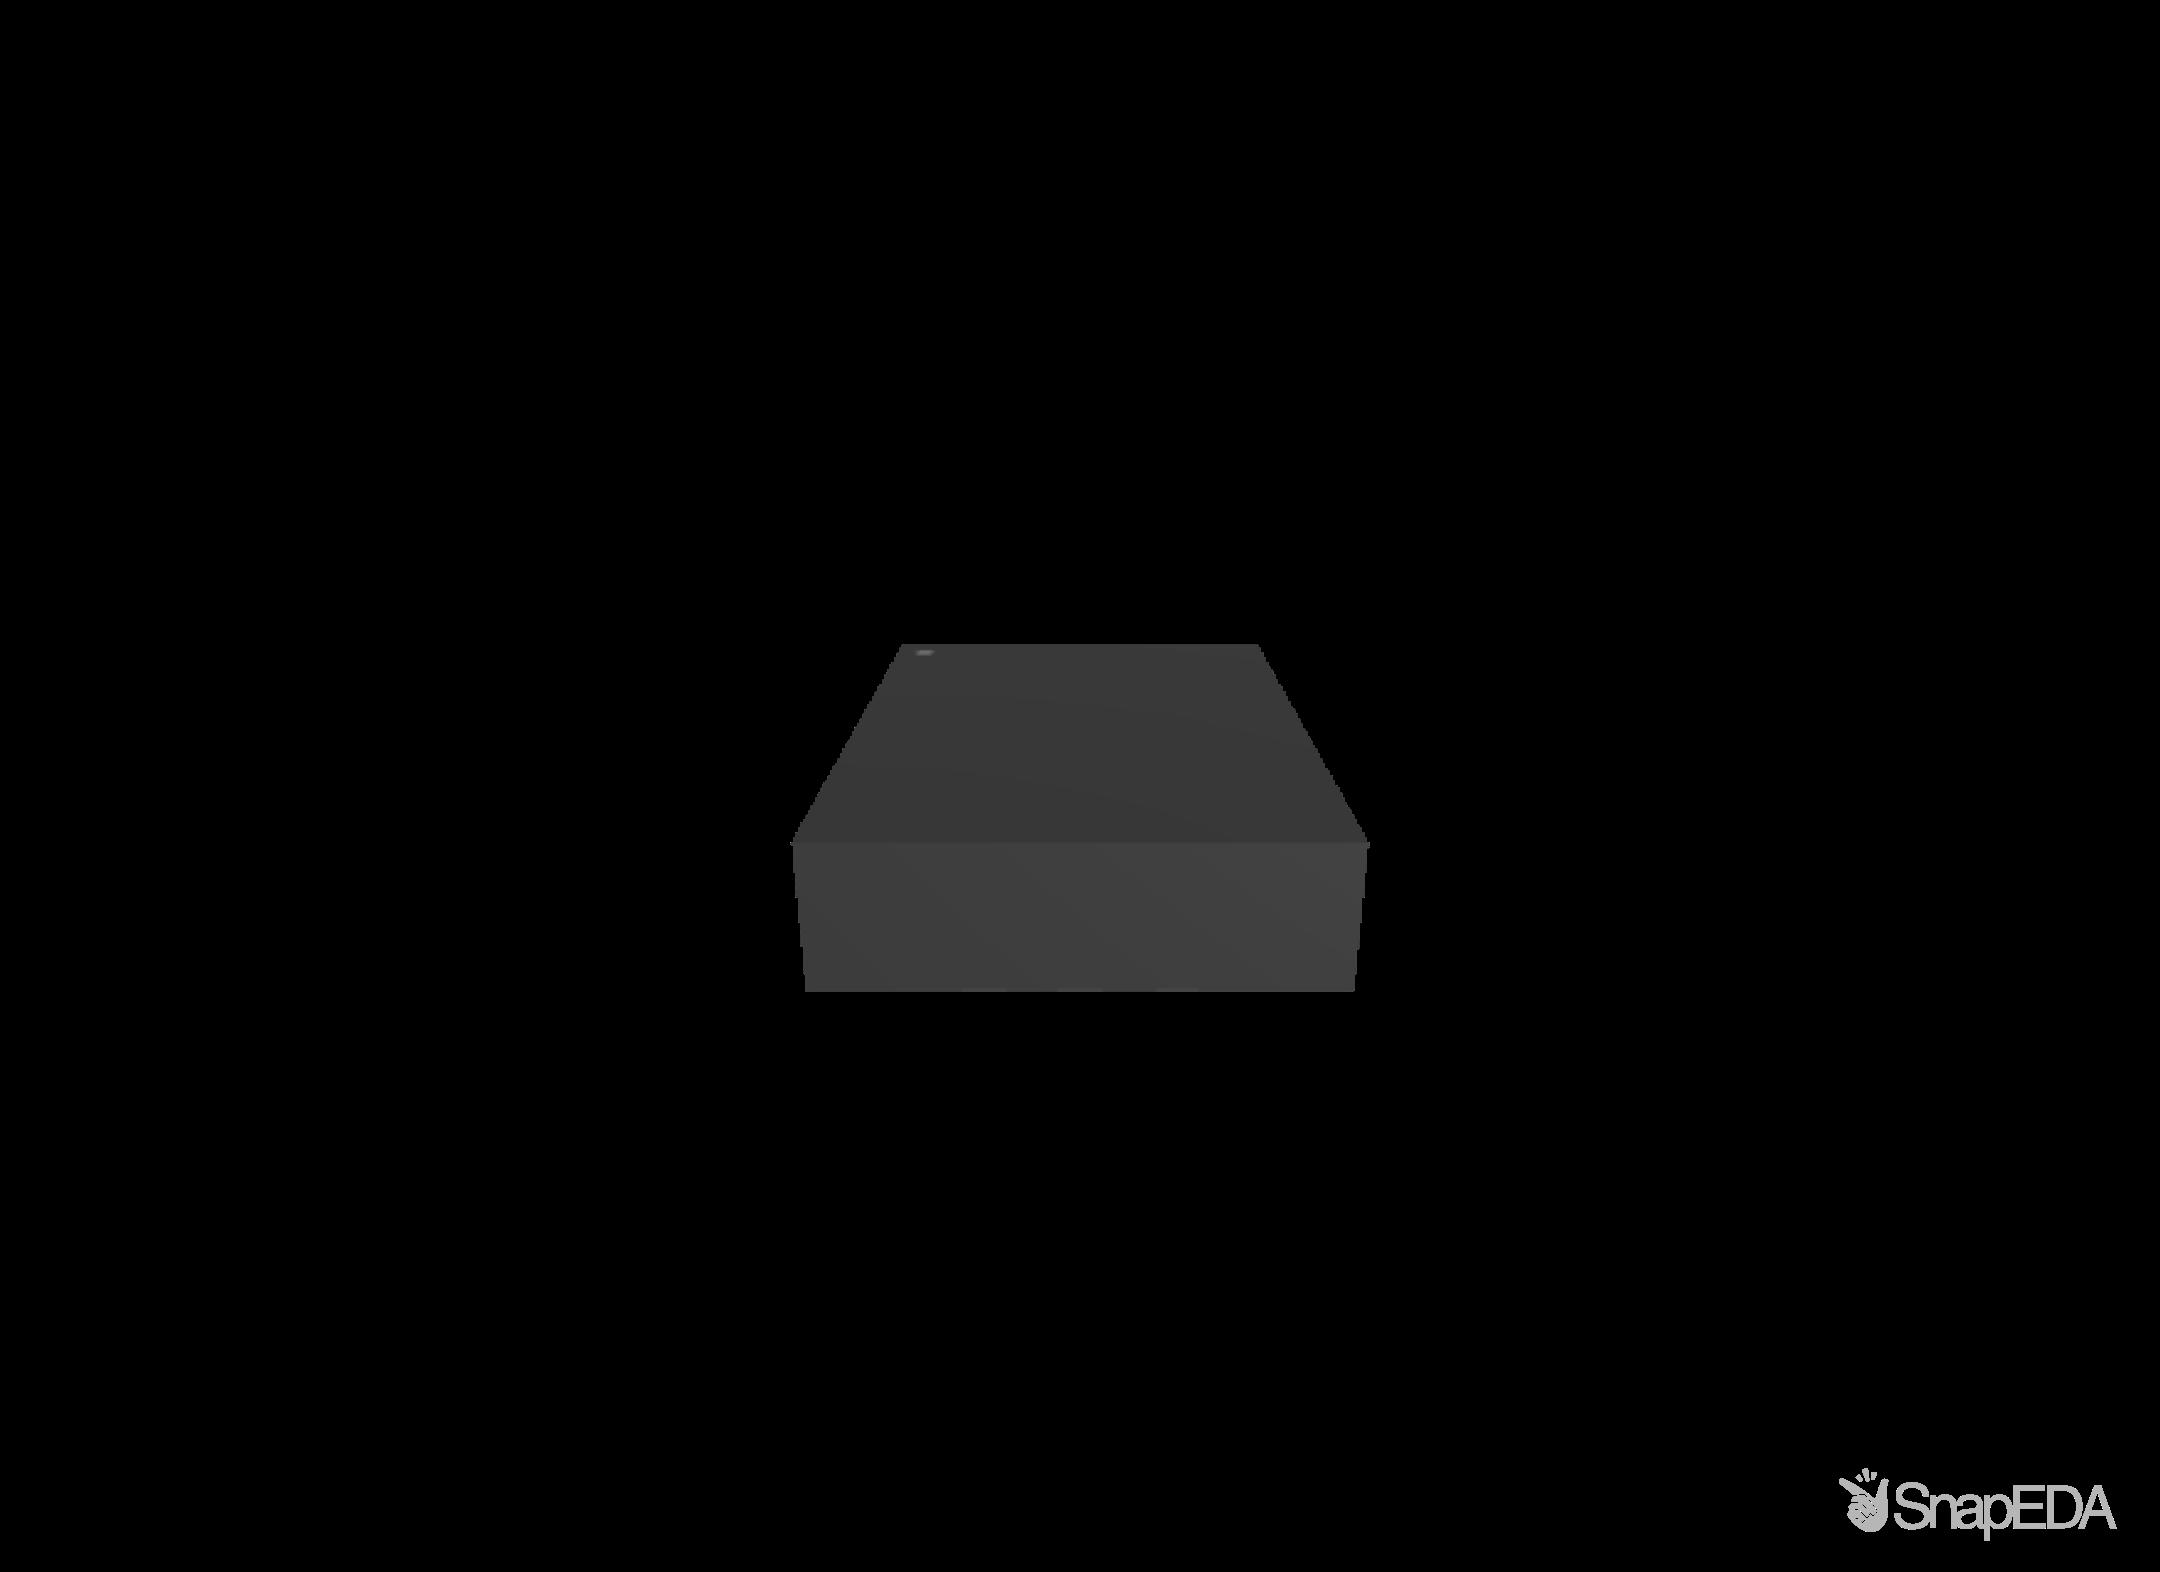 DA14531-00000FX2 3D Model